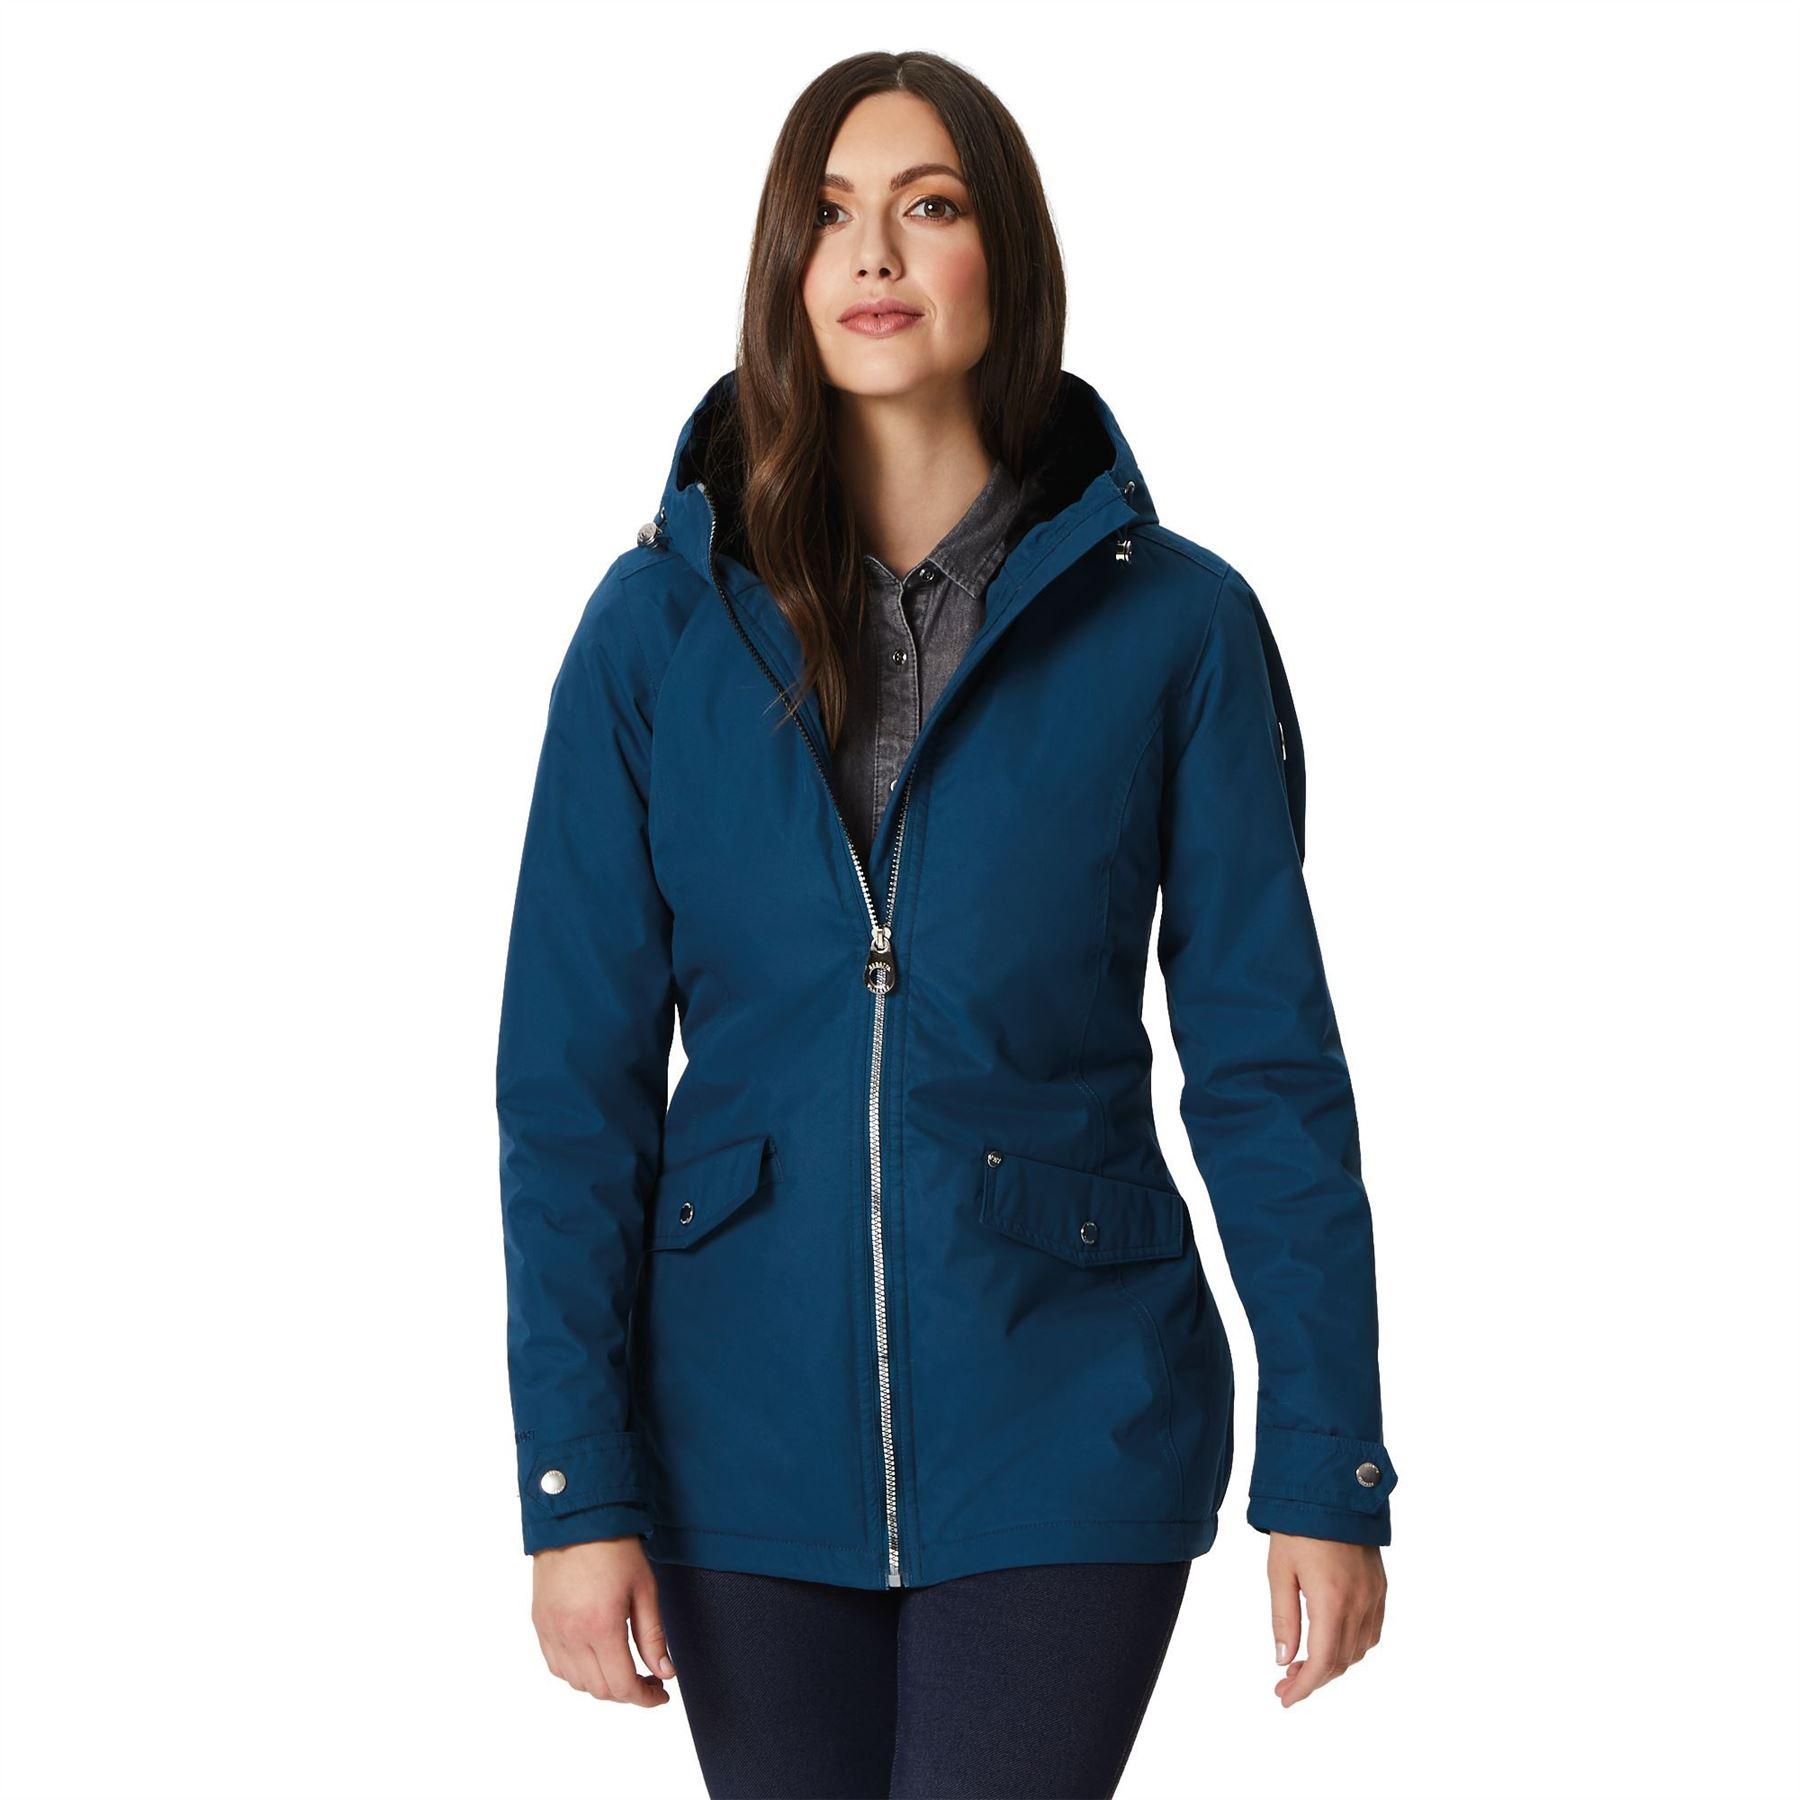 Regatta Bergonia Womens Waterproof Rain Jacket Ladies Outdoor Coat